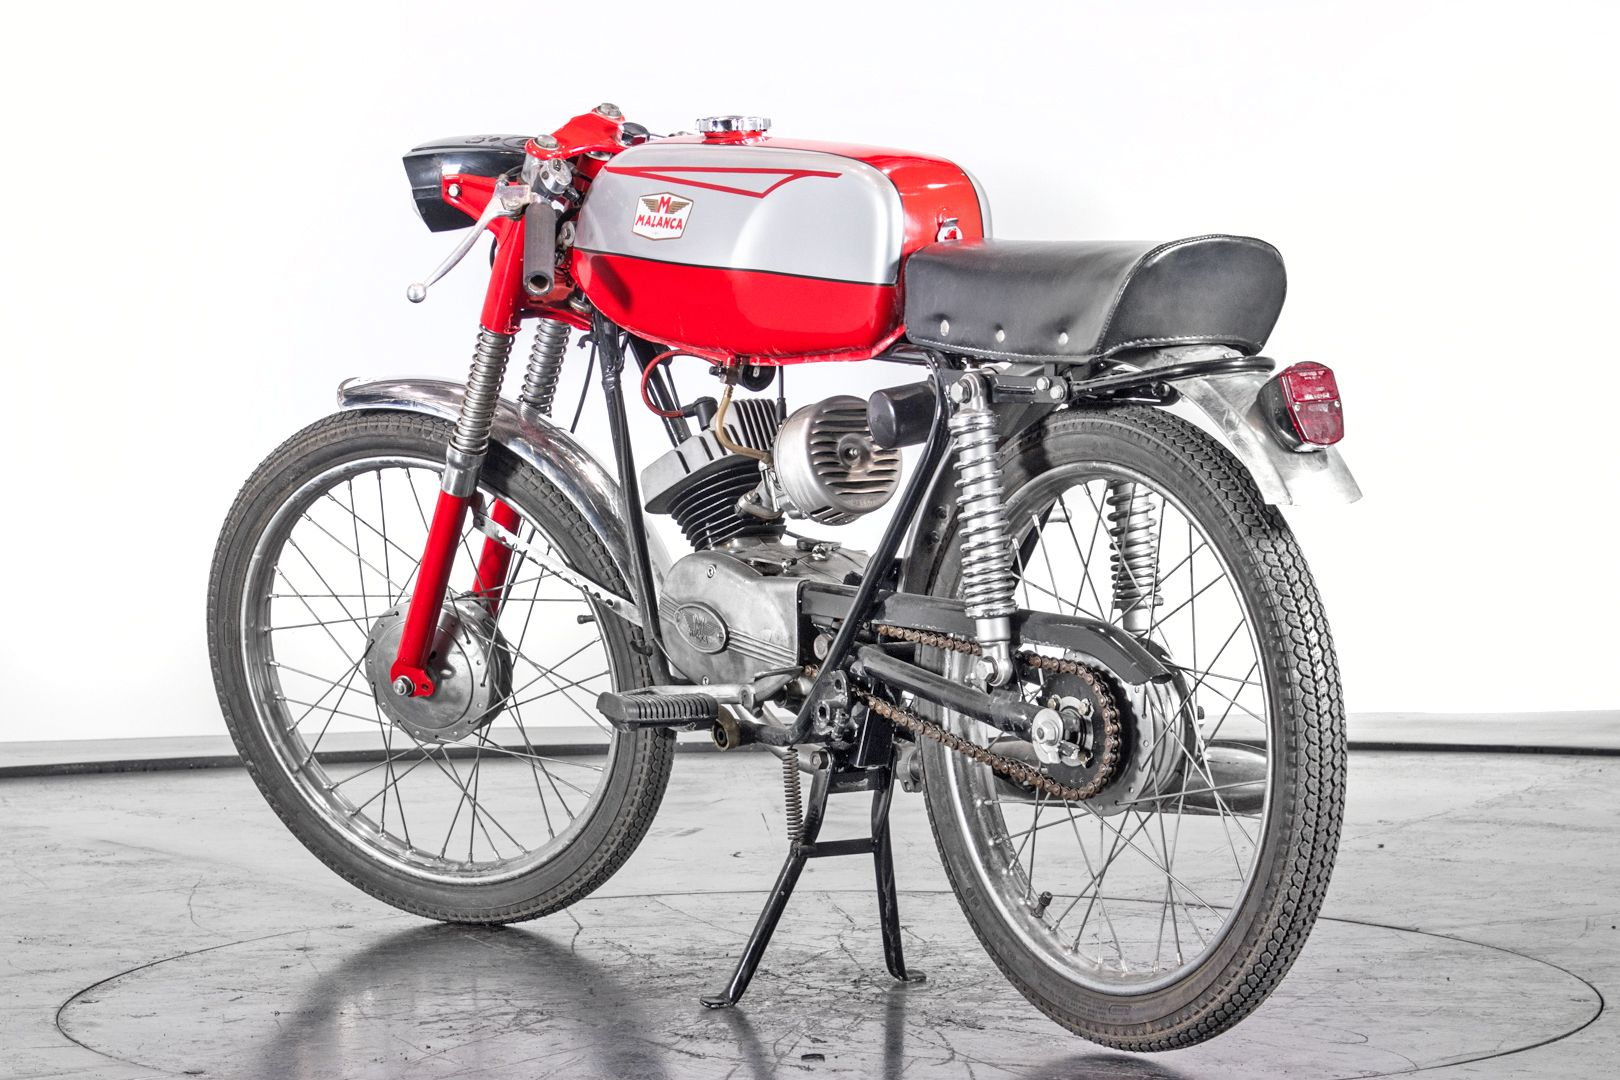 1963 Malanca Sport 41178